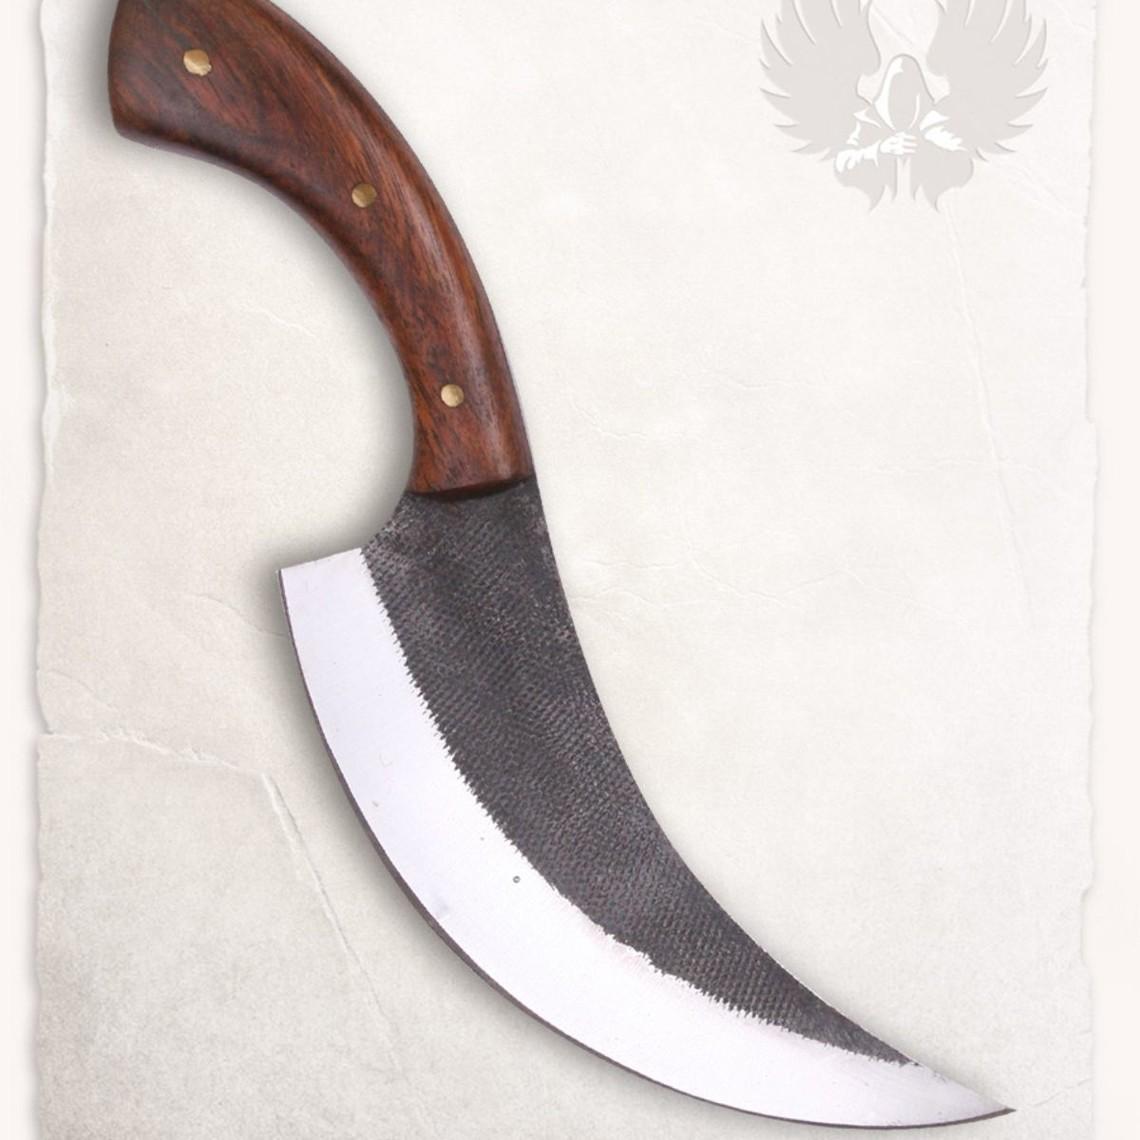 Mytholon hierba medieval cuchillo Anselmo